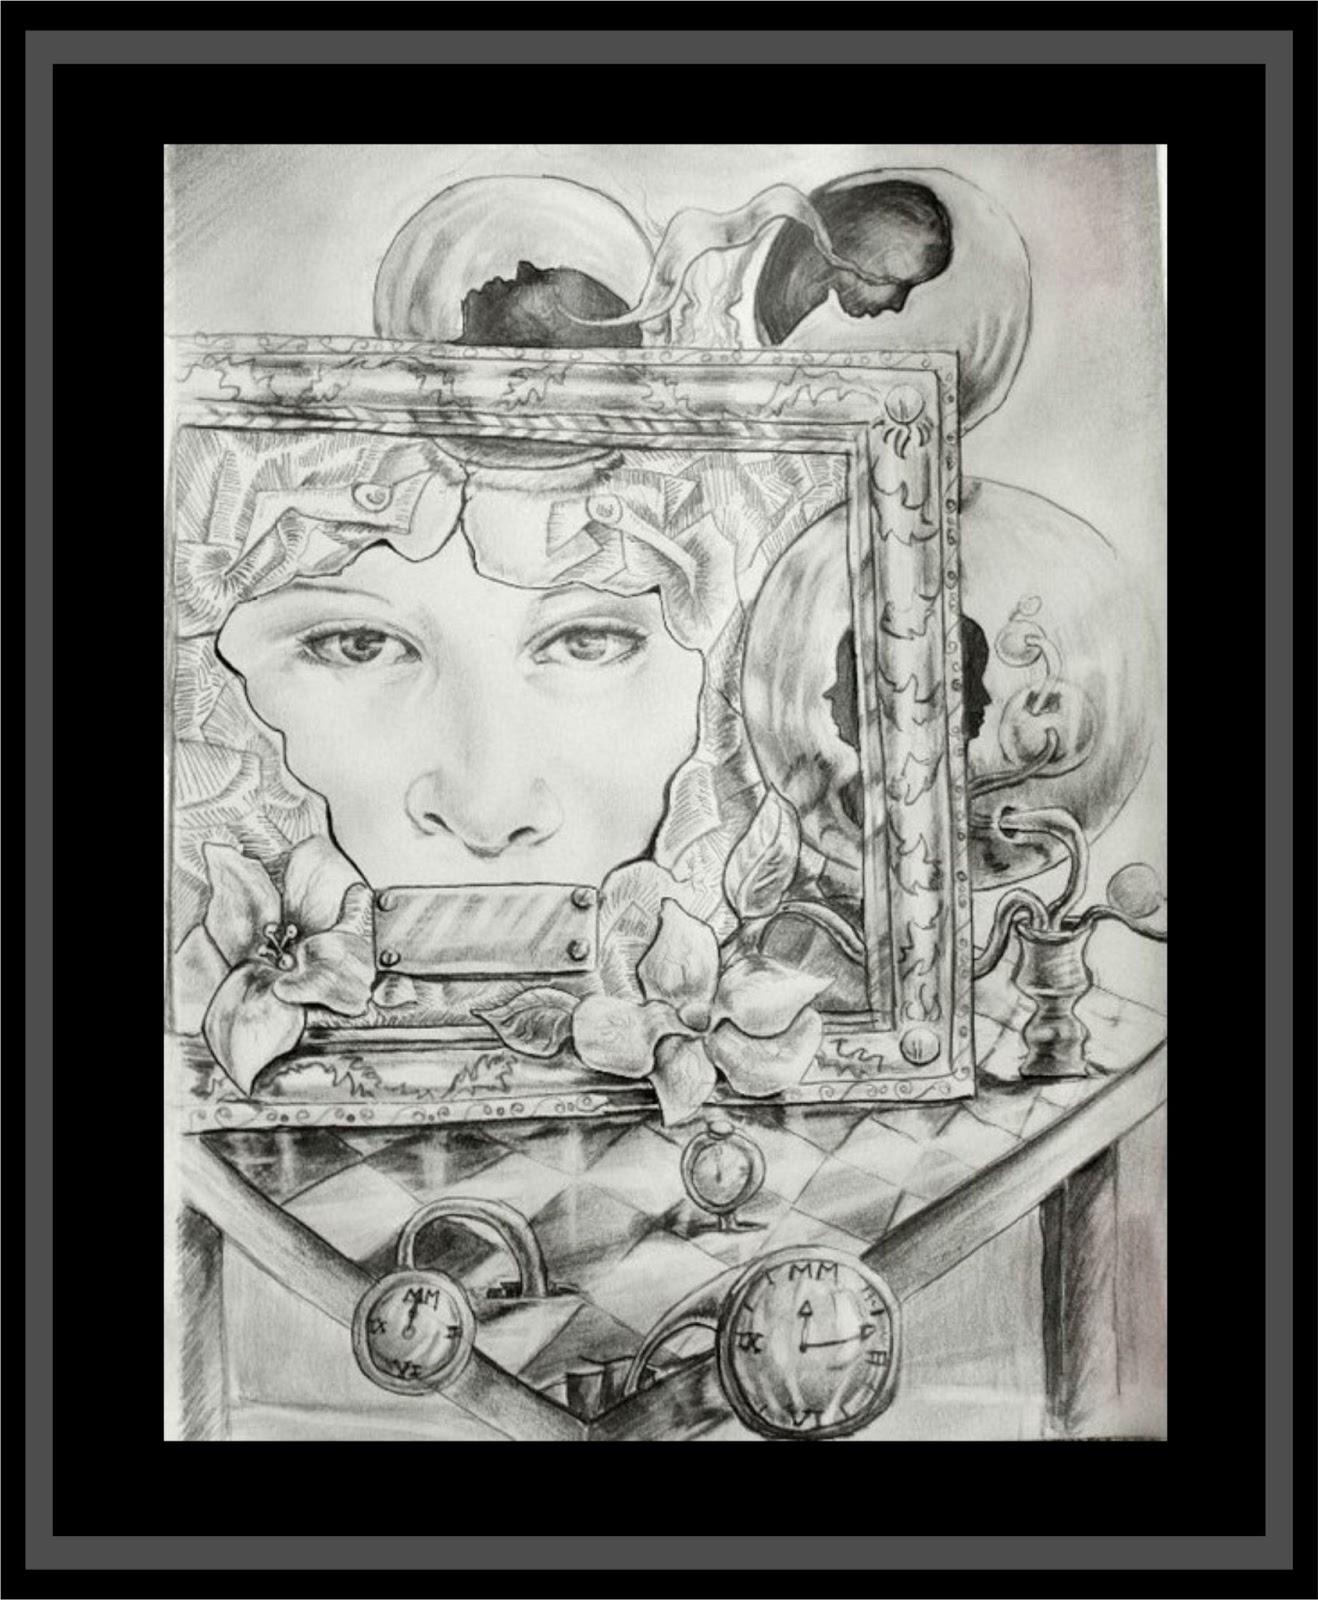 Art Drawings: Alas Art: Meaningful Drawings